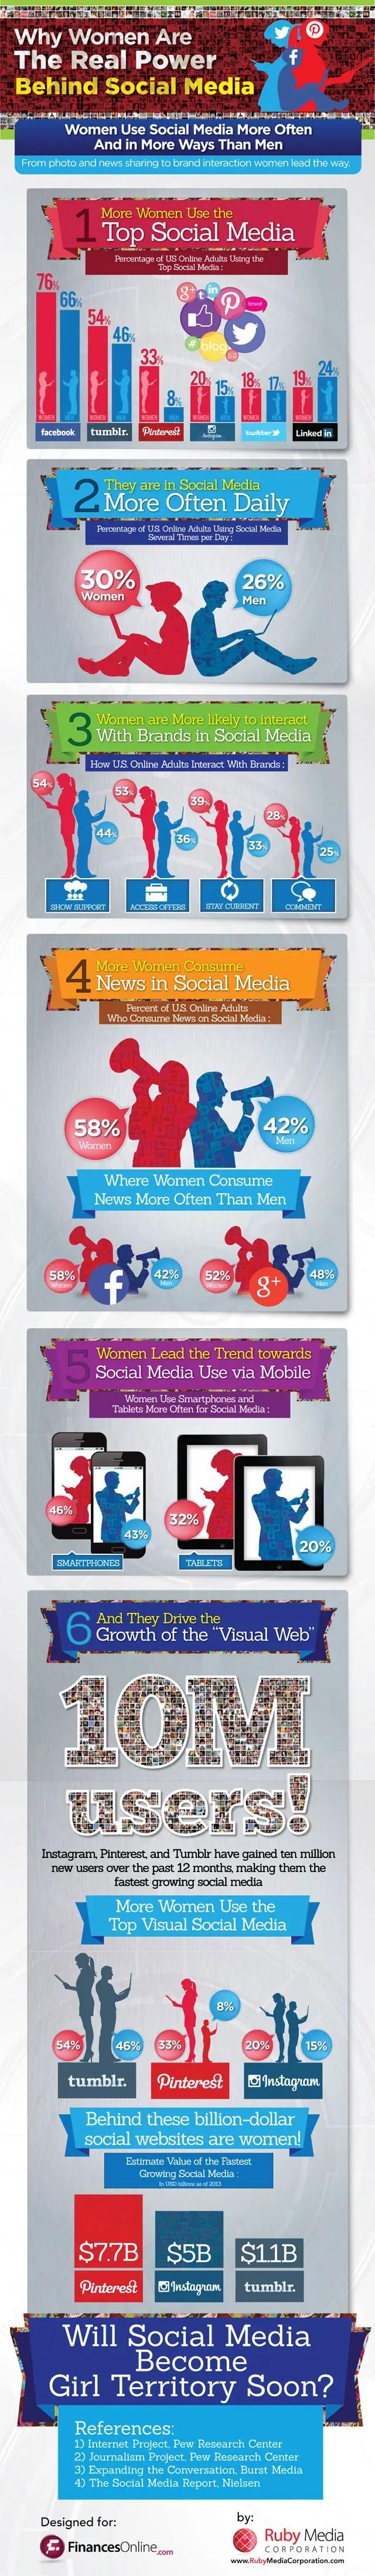 social-media-infographic1-1